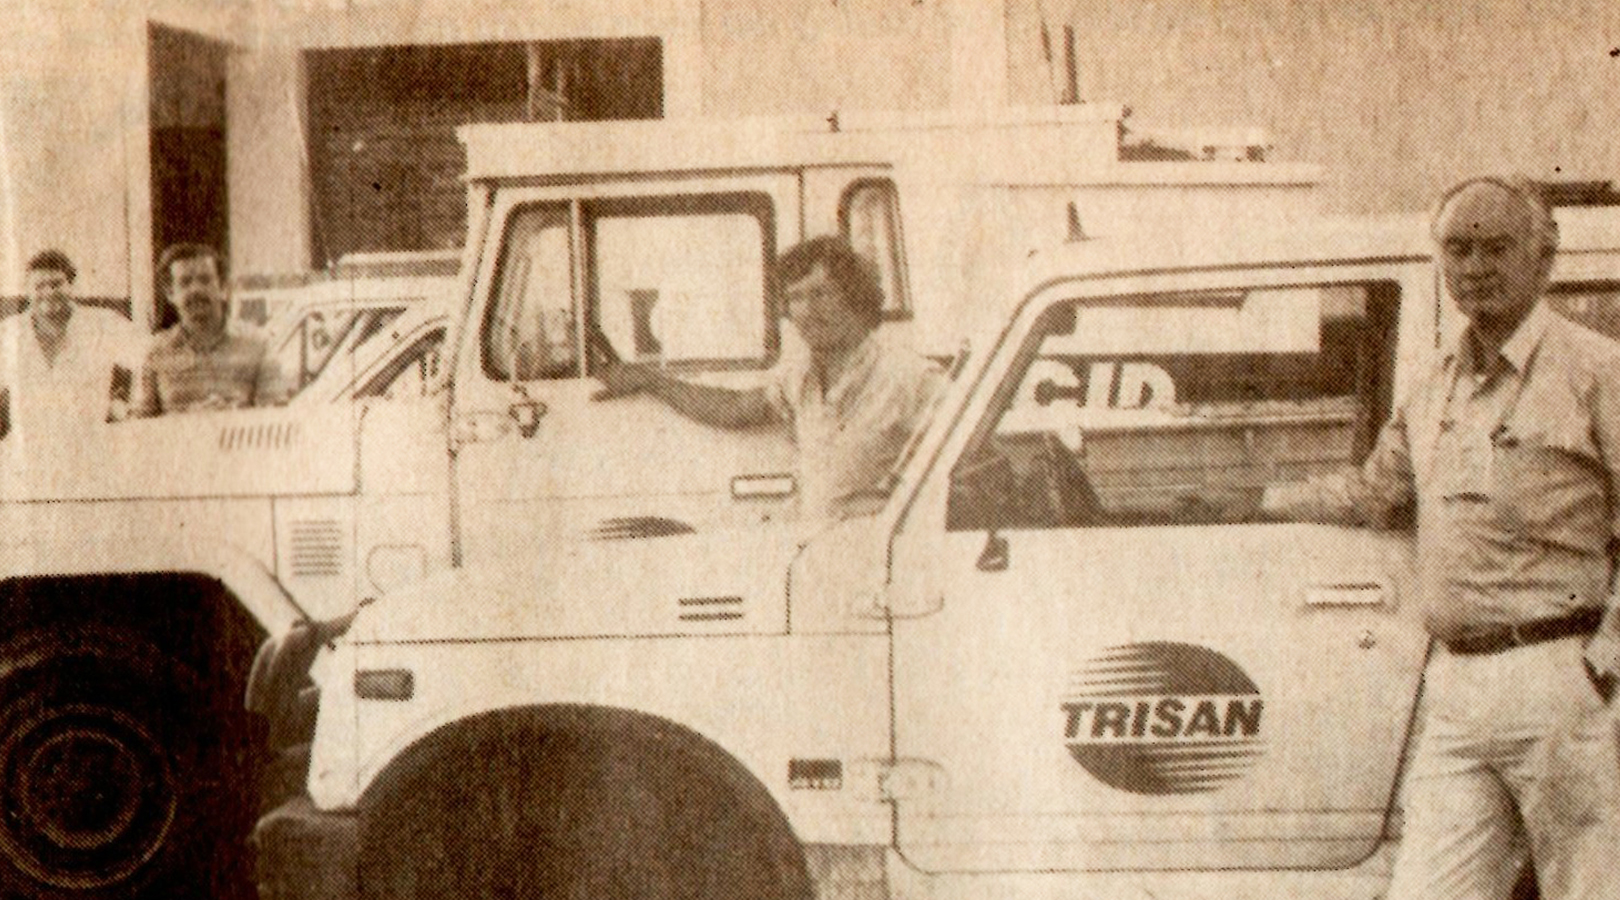 Trisan_1970_4